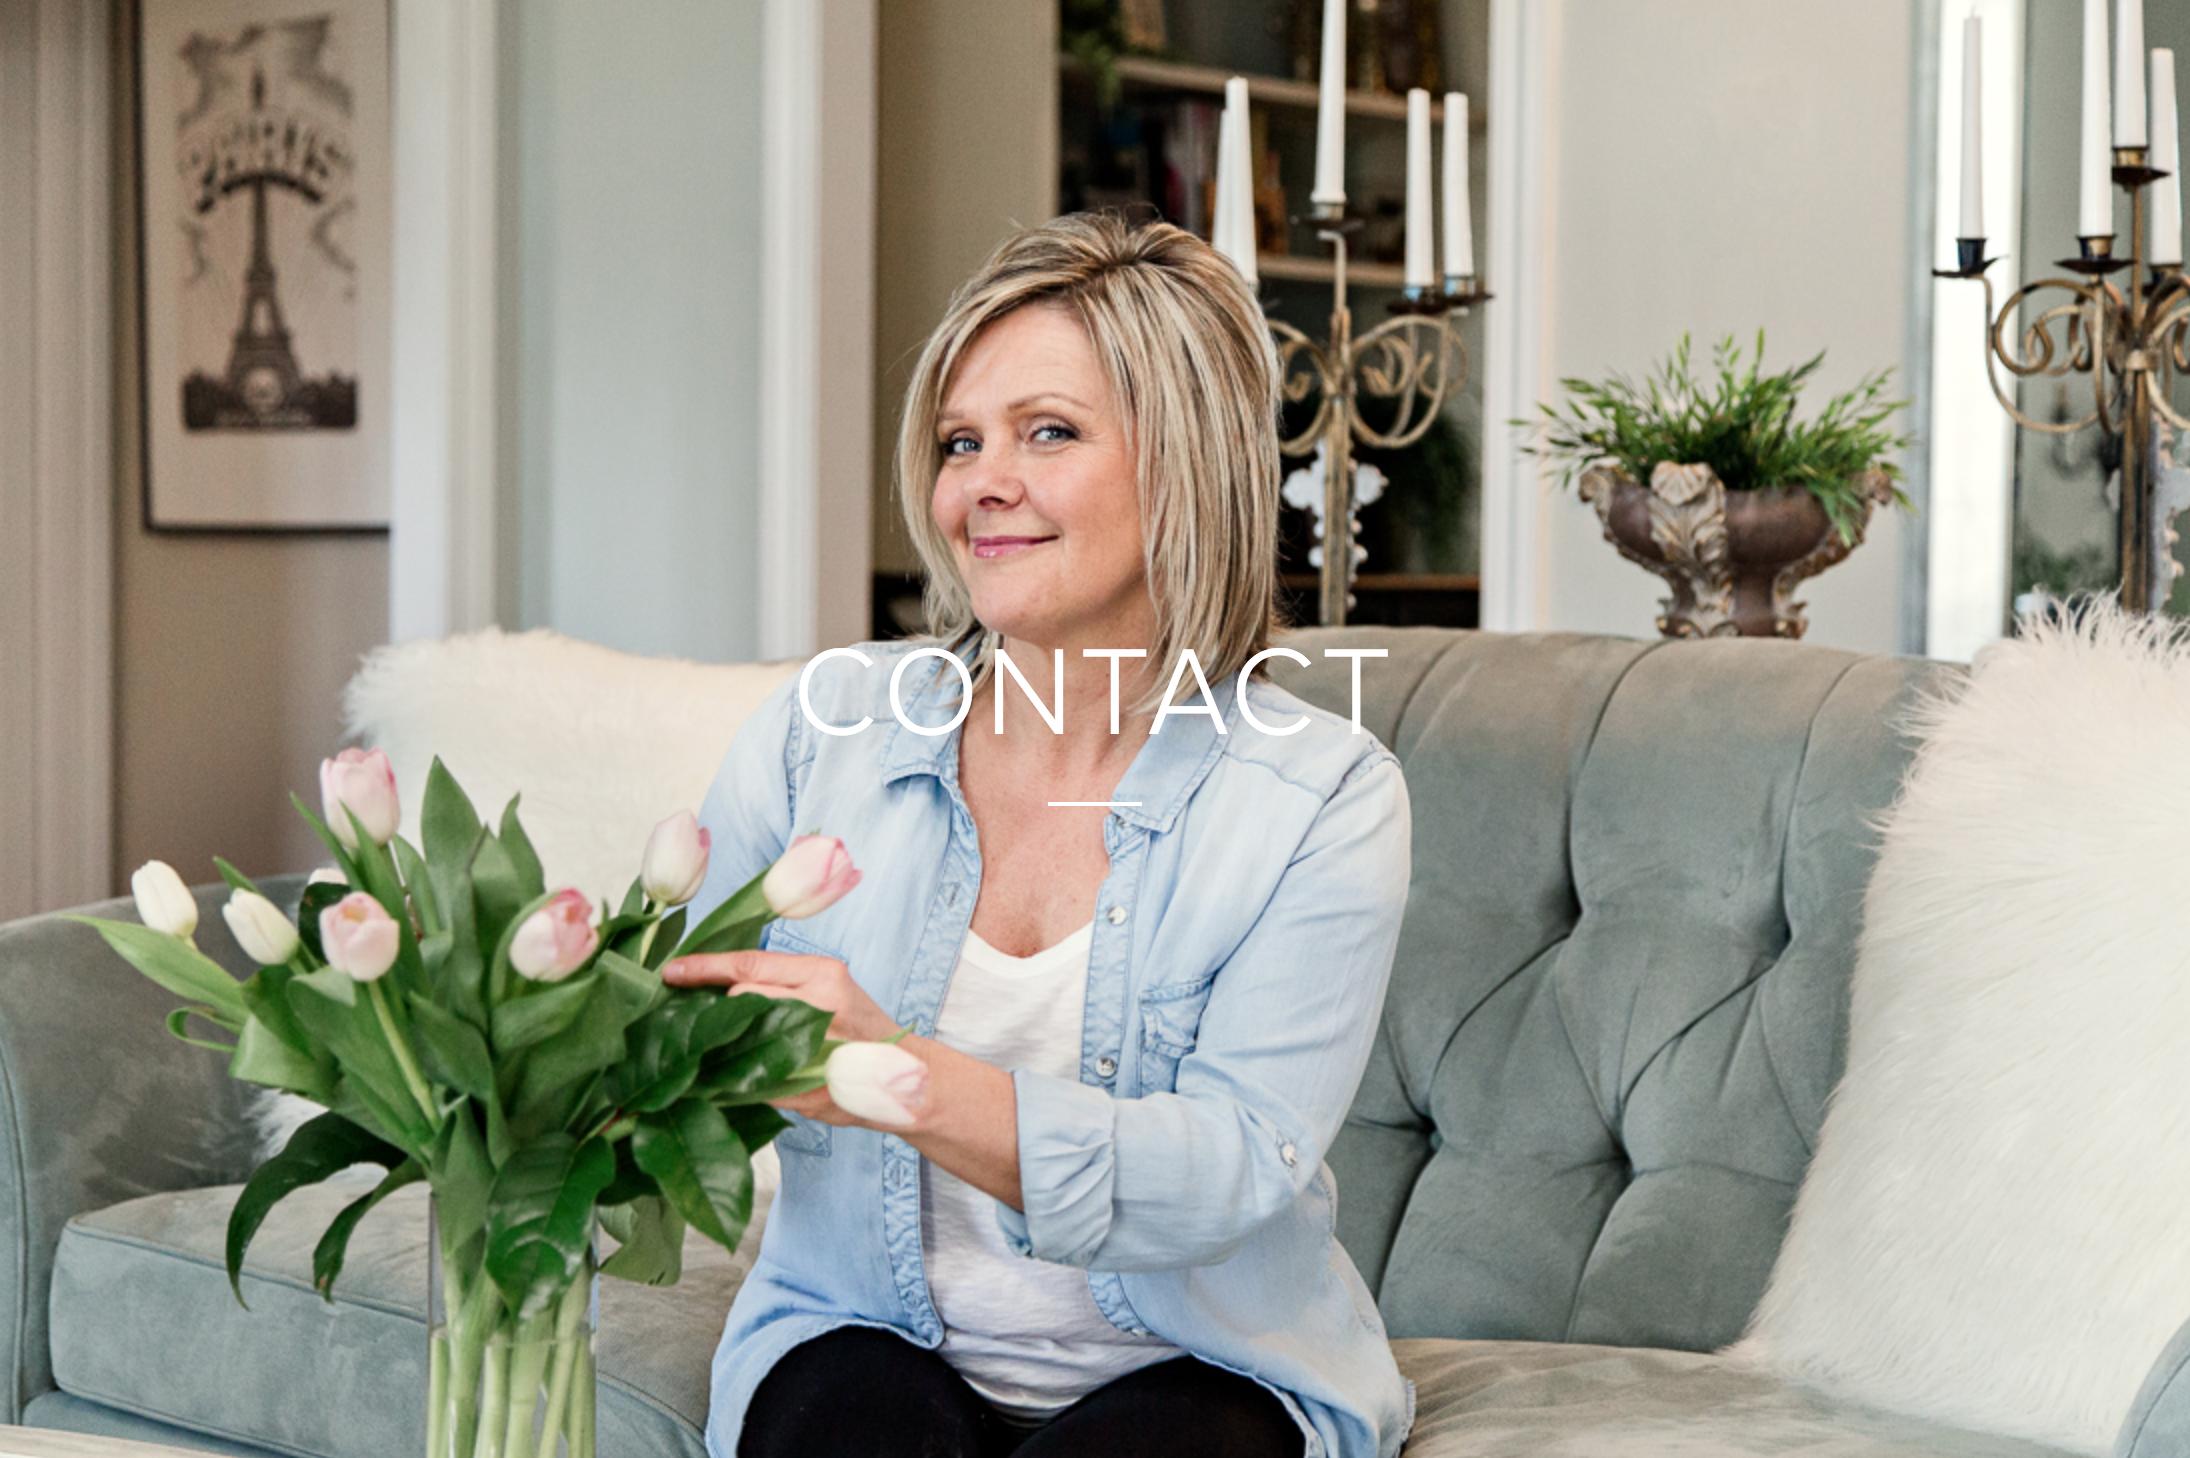 Contact Barb